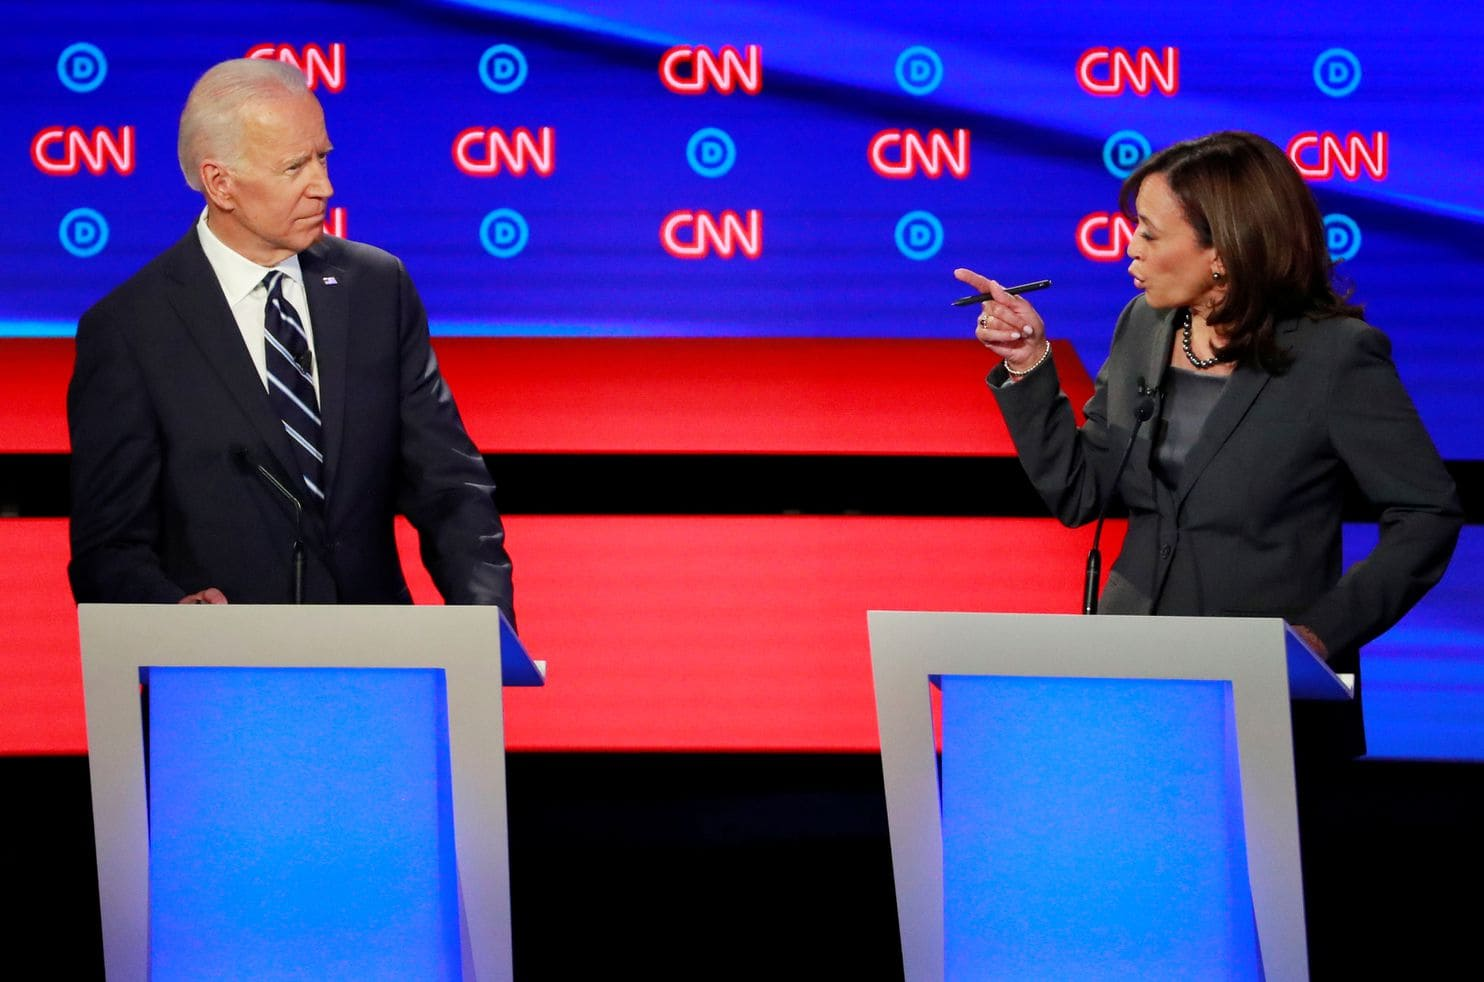 Joe Biden, Kamala Harris, Democratic, Debate, Presidential, NewsMobile, Mobile, News, India. World, Donald Trump, United States, World